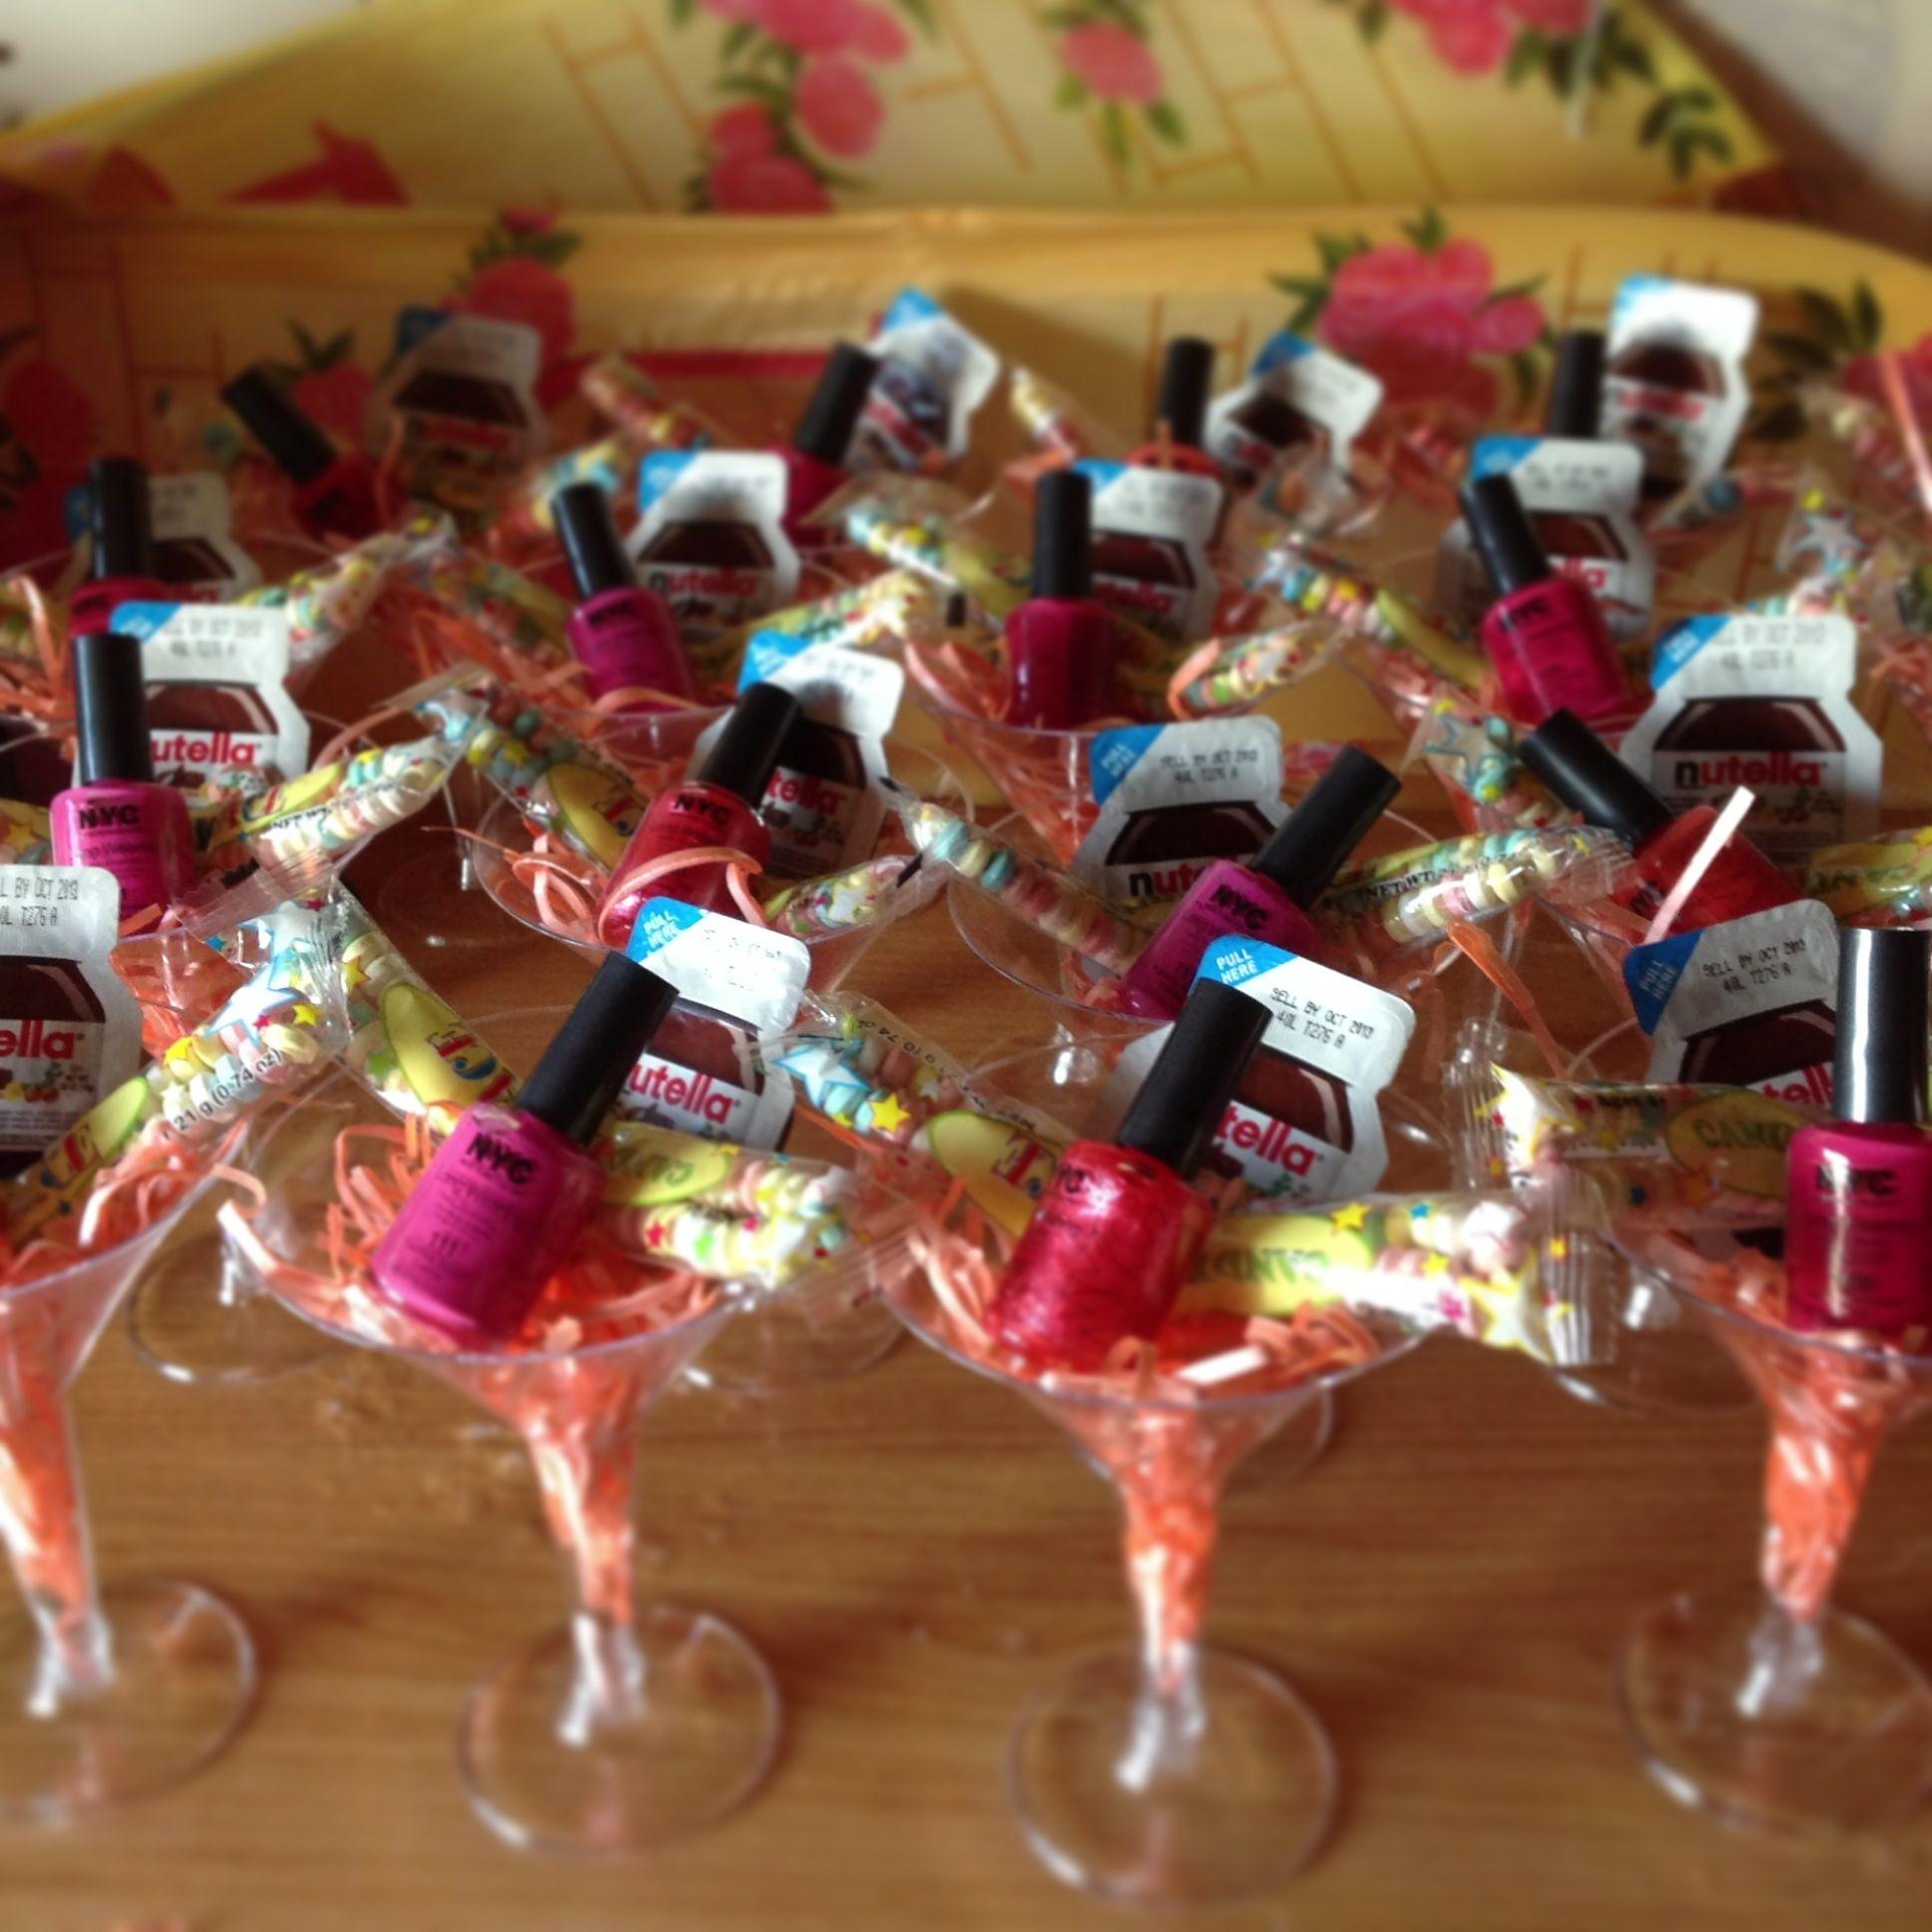 Best Wine For Wedding Gift: Bridal Shower Favor Idea. Like Idea Of Something In